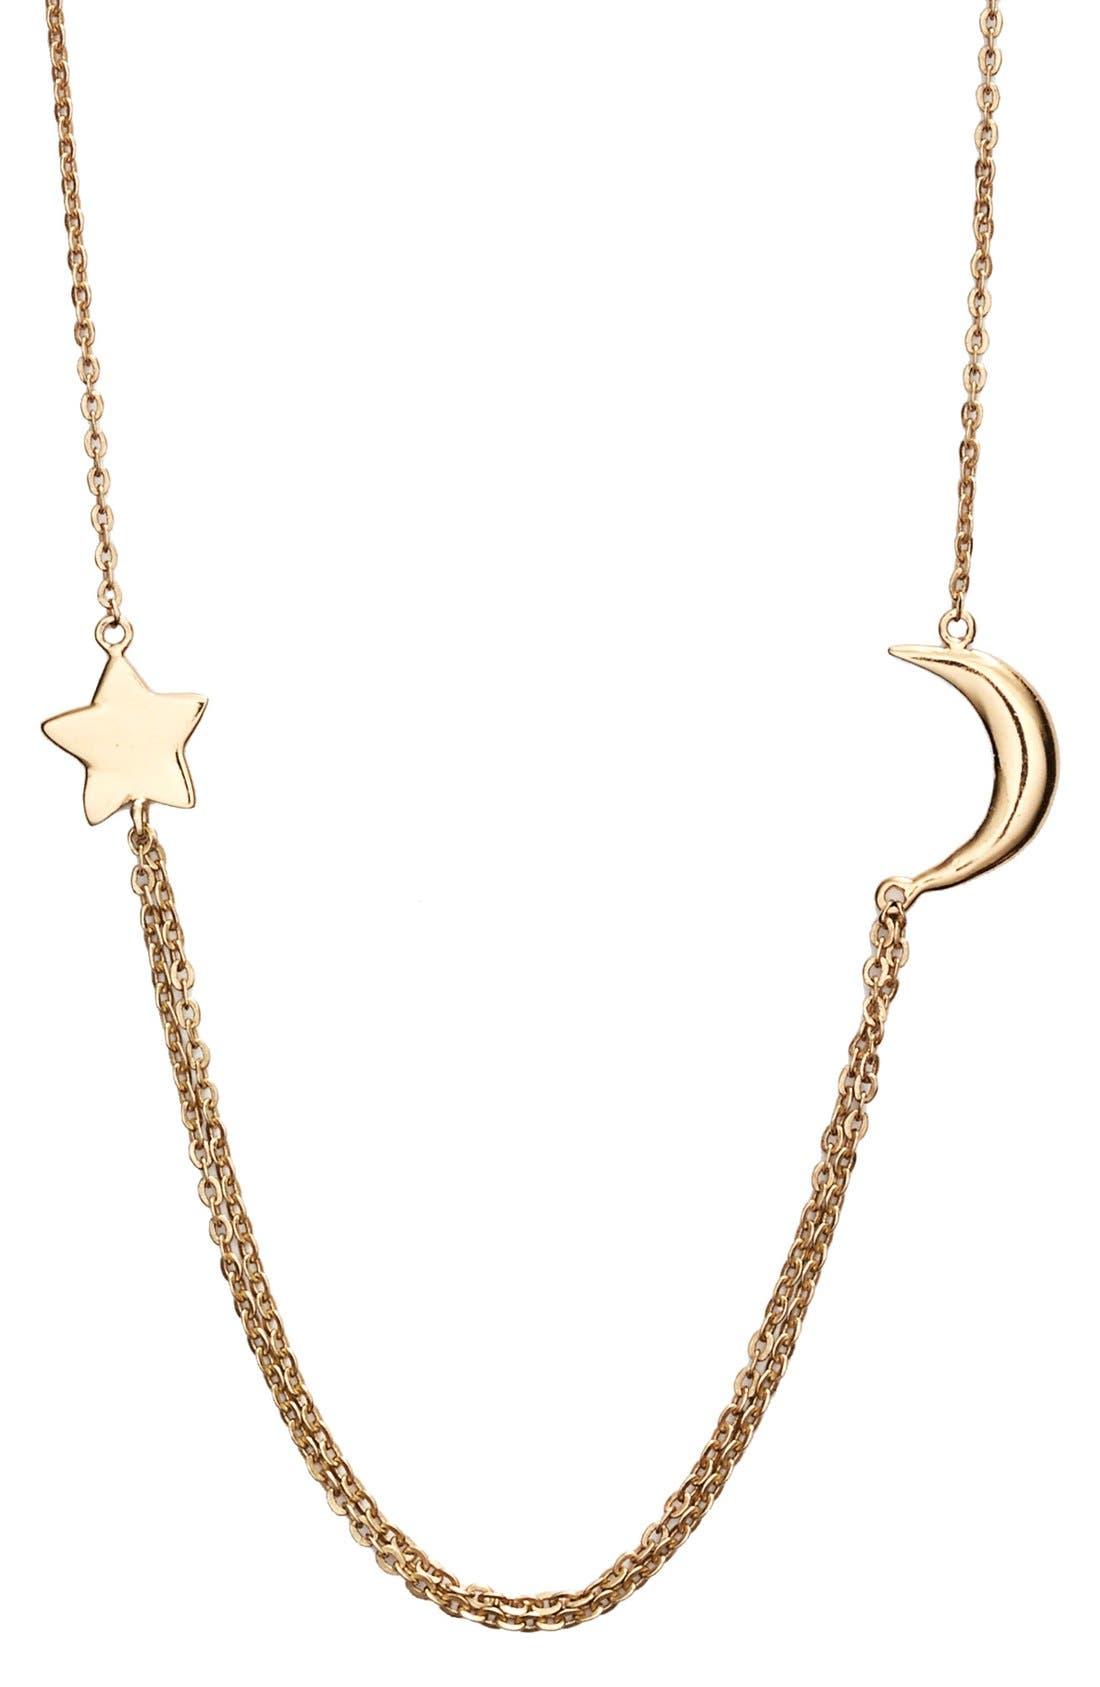 Main Image - Melinda Maria Moon & Star Station Necklace